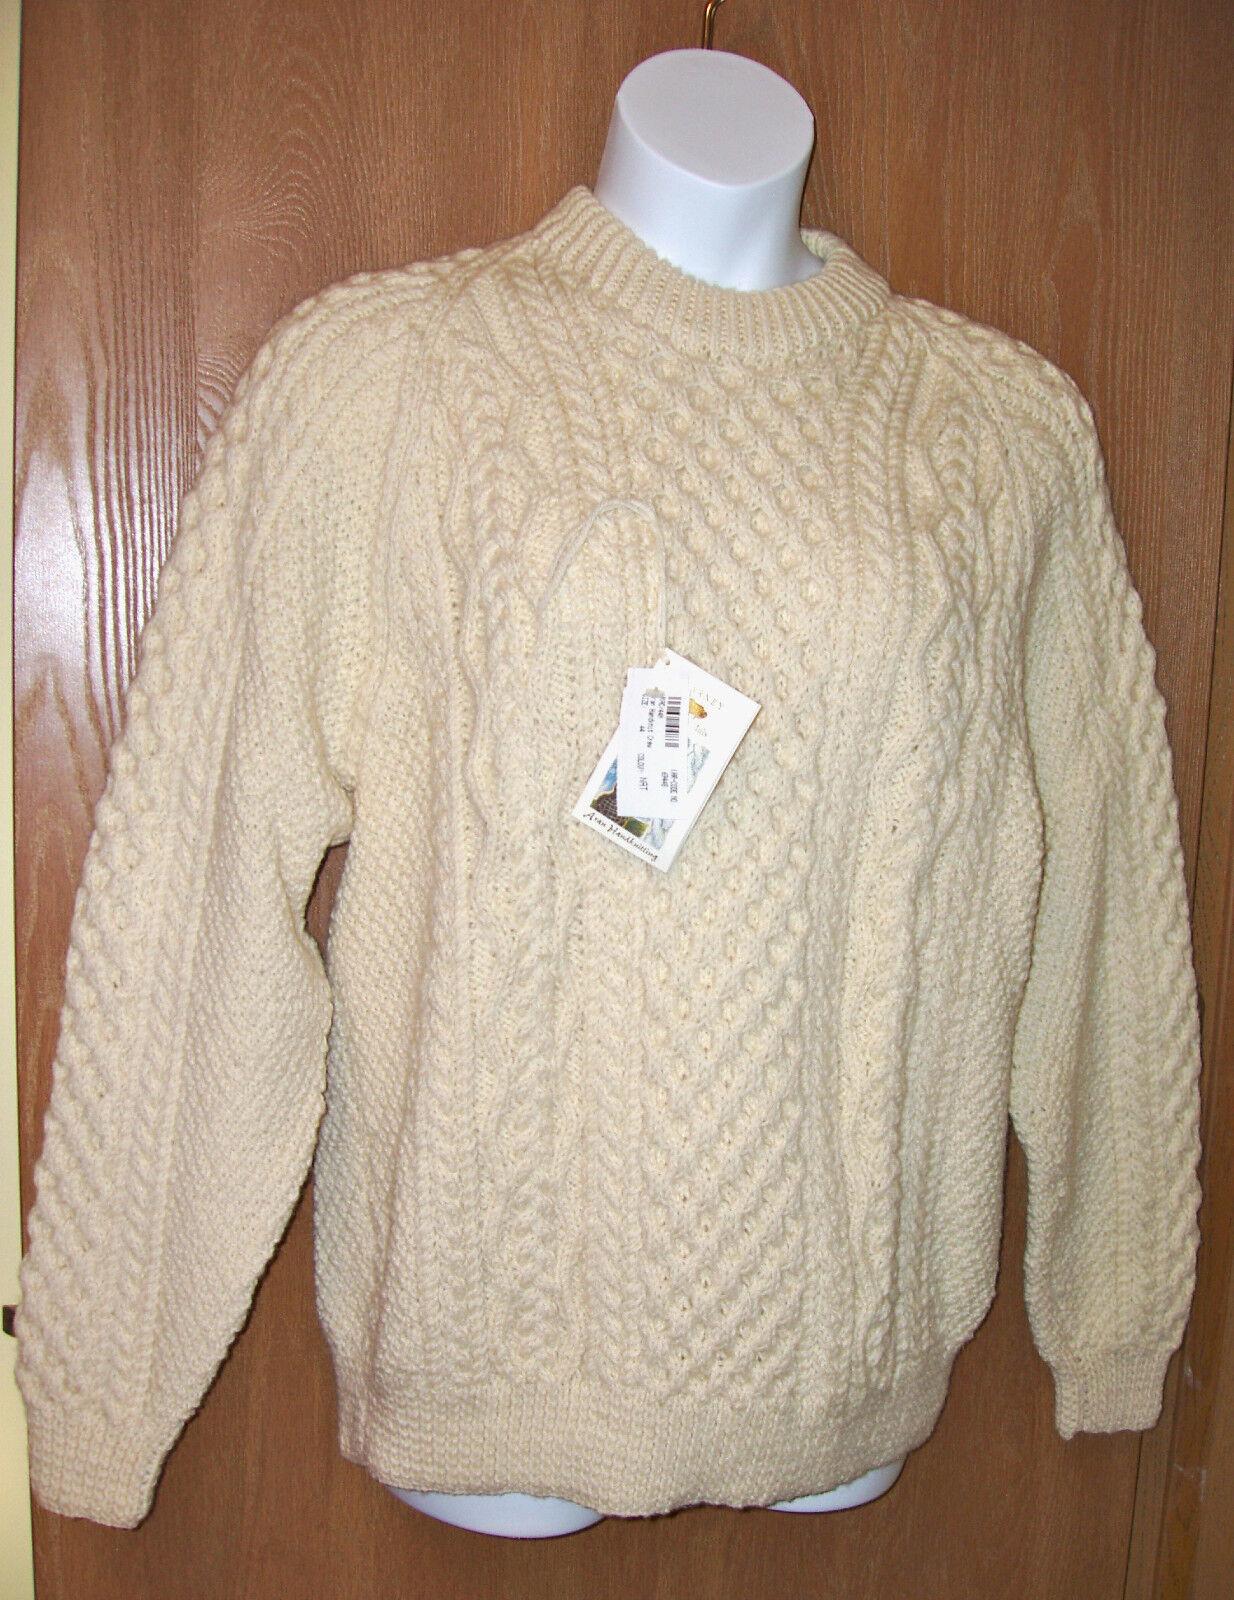 BLARNEY 100% Woollen Mills Ladies LG LG LG  Mens MED Fisherman Sweater Never Worn 3286a2